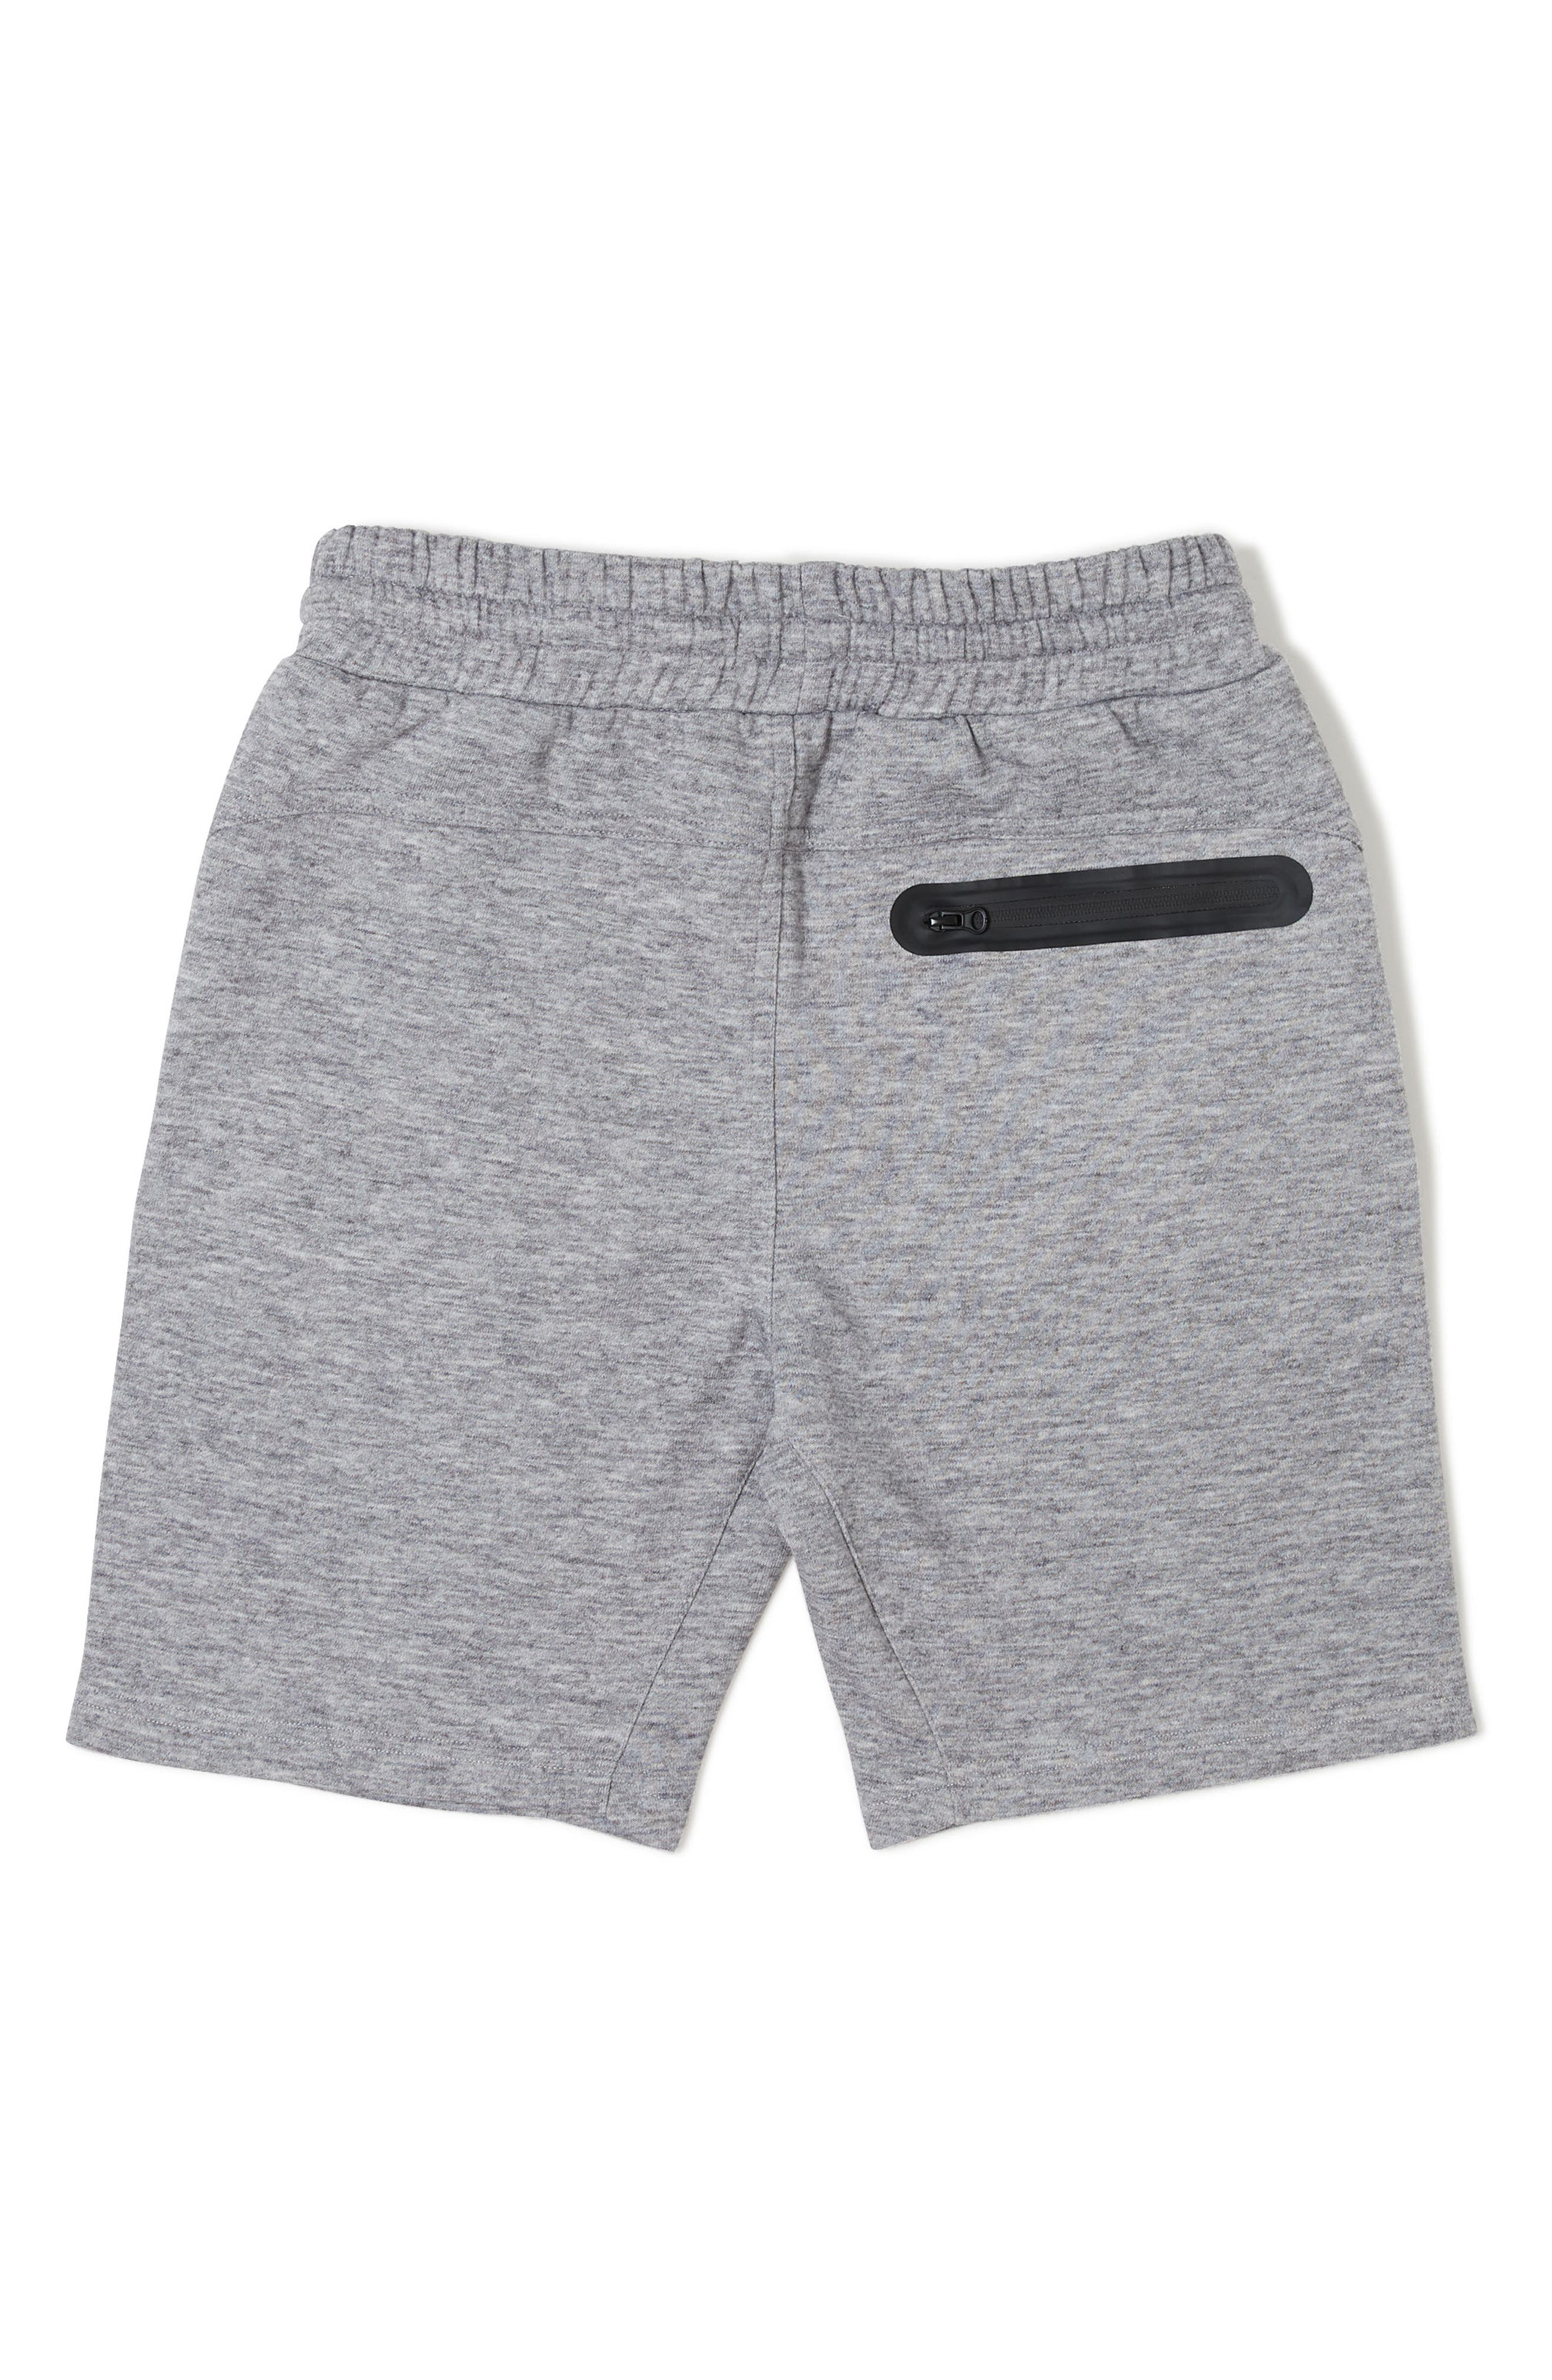 Rhett Knit Shorts,                             Alternate thumbnail 2, color,                             HEATHER GREY